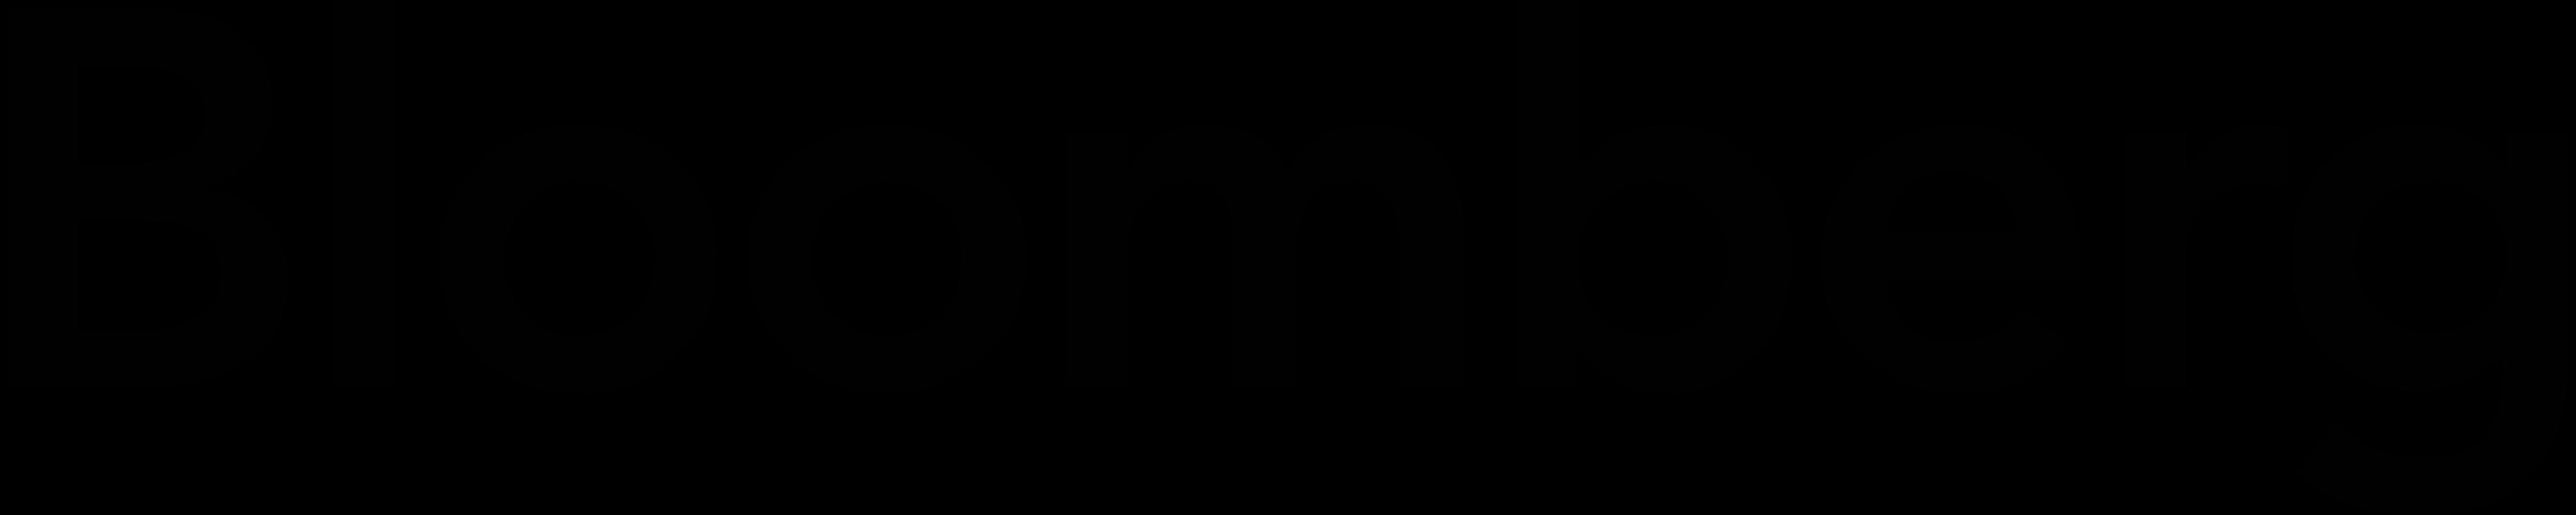 Bloomberg logo, logotype, emblem